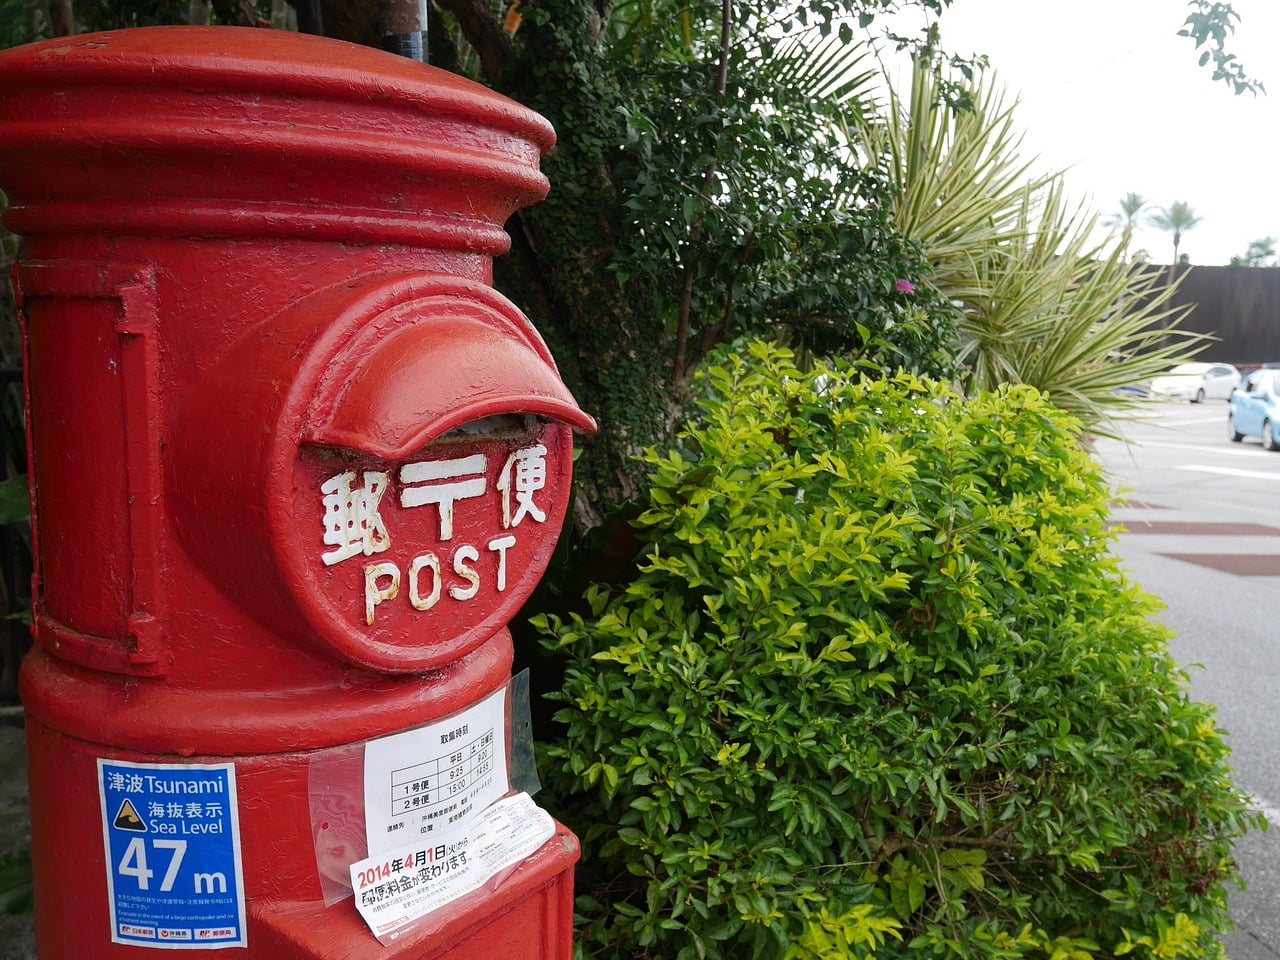 Old Red Postal Japan Post 20180131 日本郵便局2萬分行提供中日文翻譯 包裹郵寄與行李寄存旅行服務